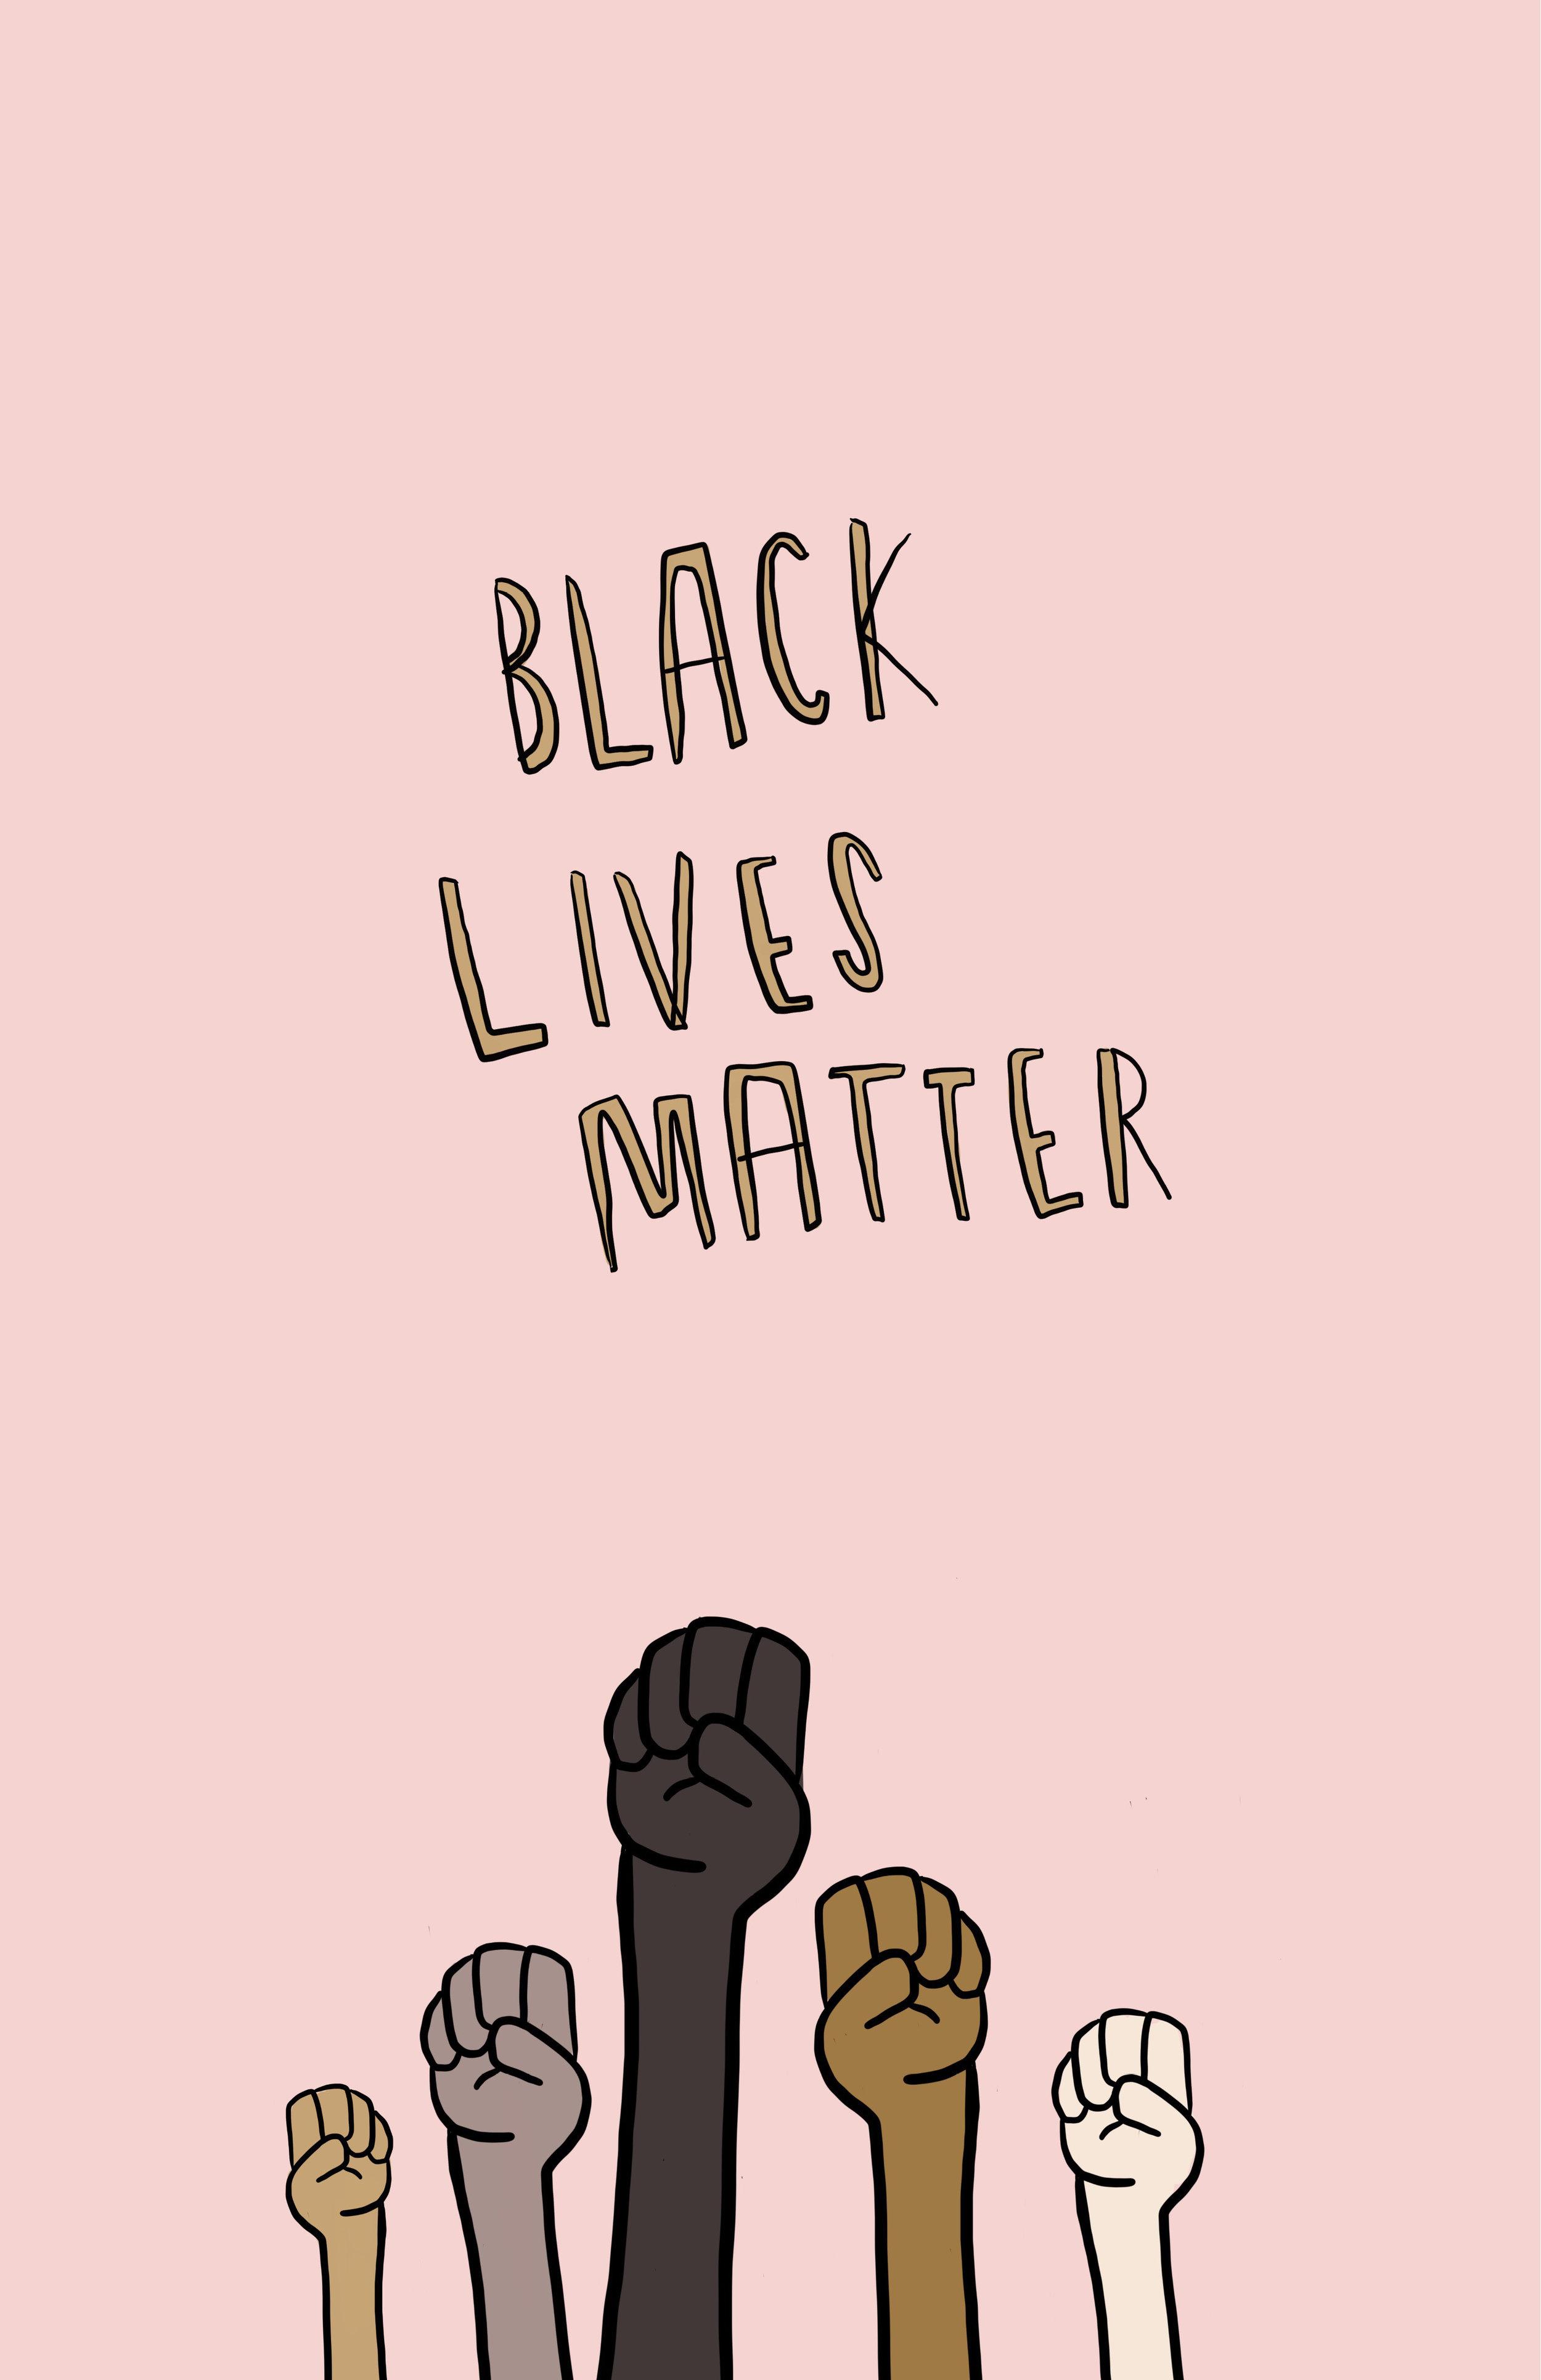 Black Lives Matter Posters2.jpg